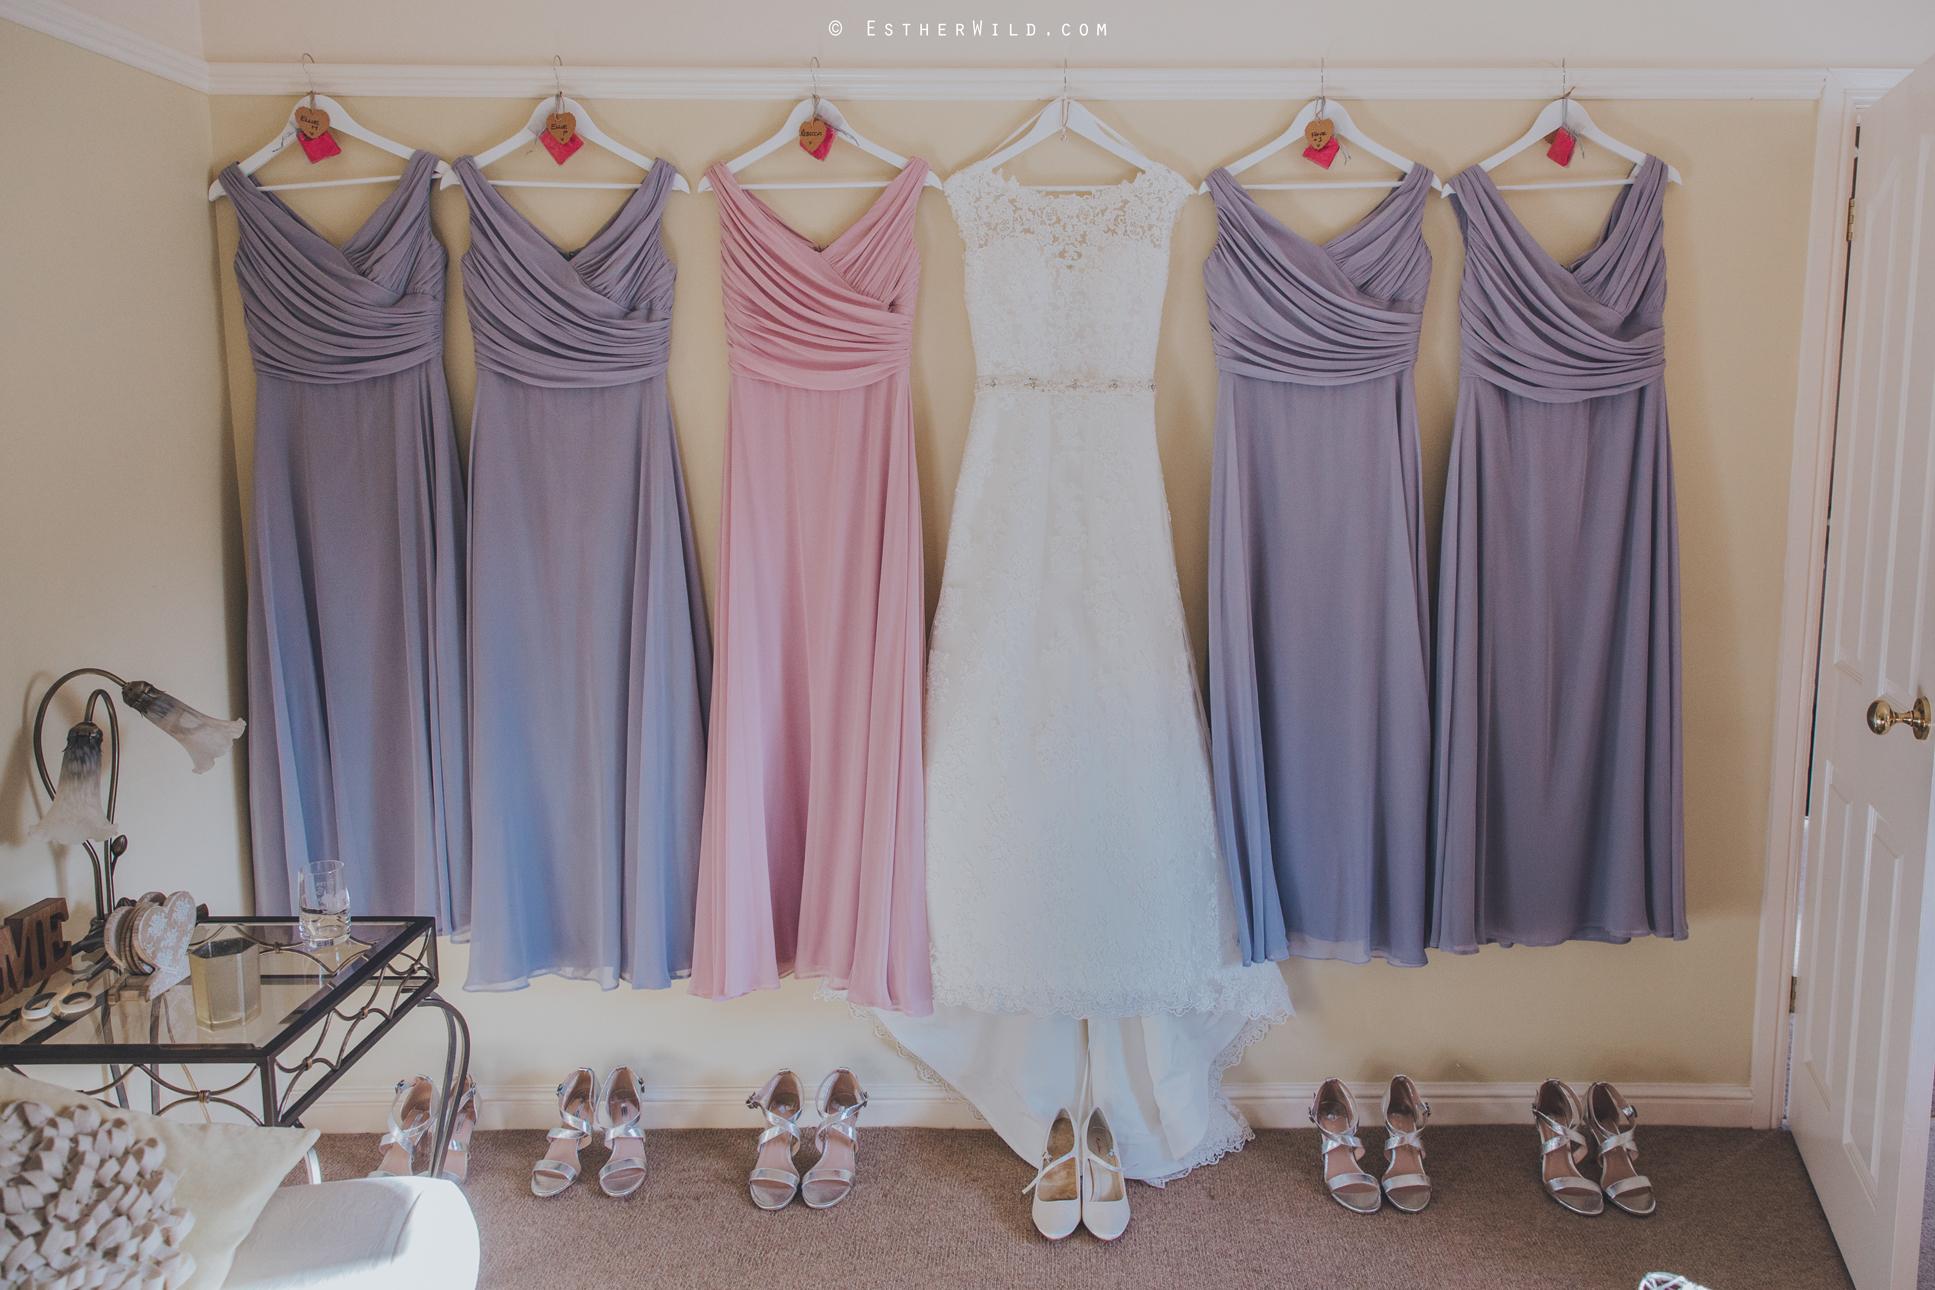 Wedding_Kings_Lynn_Town_Hall_Norfolk_Photographer_Esther_Wild_IMG_0144.jpg